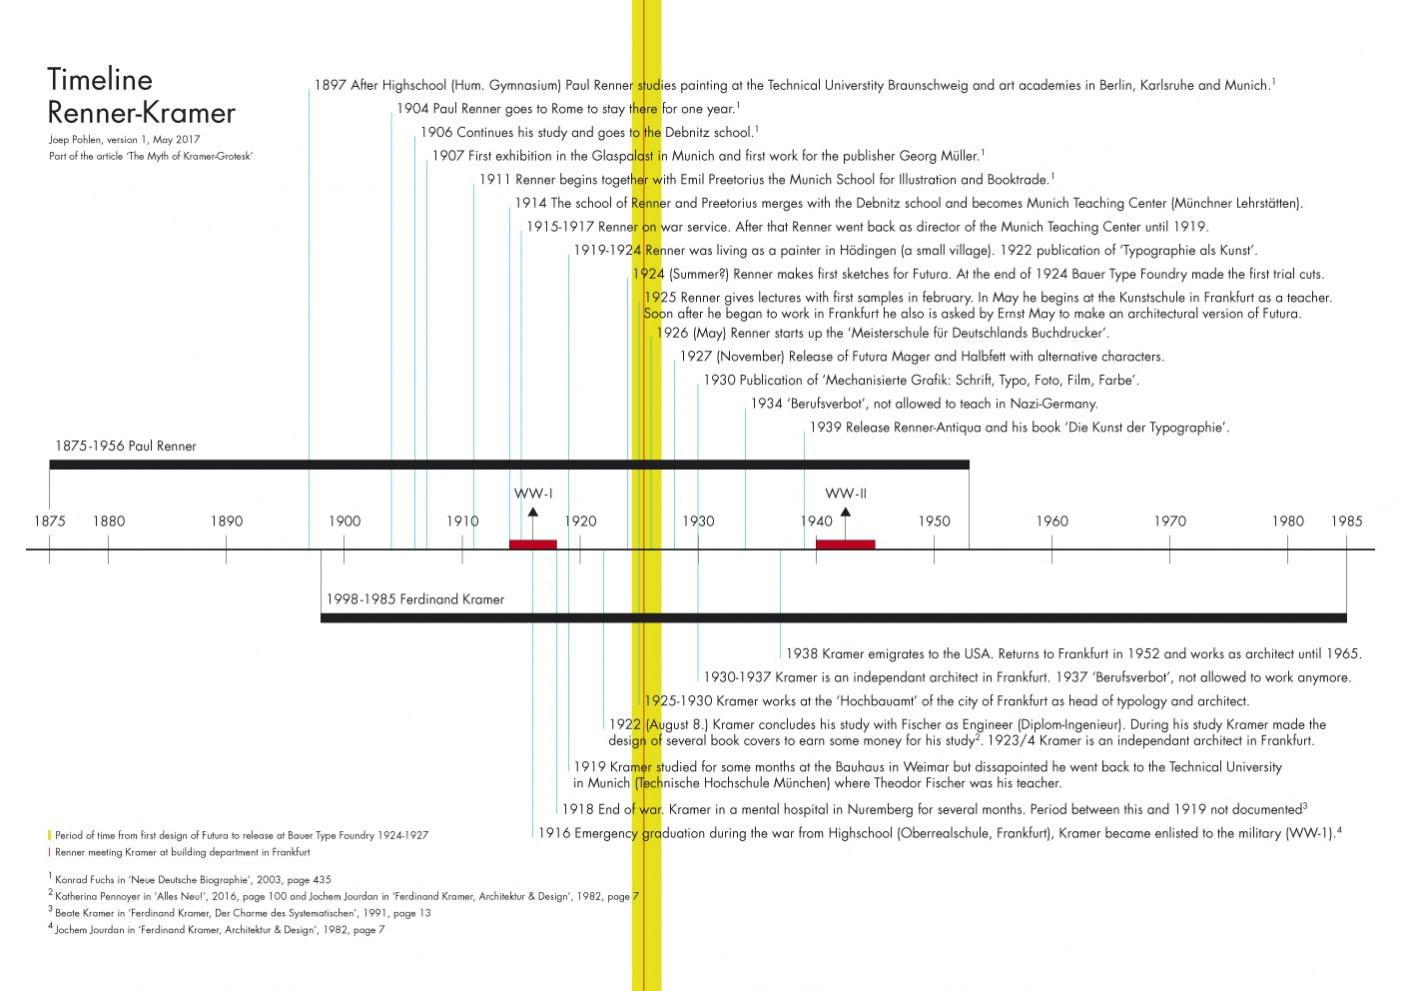 10Picture_Timeline_Renner_Kramer_JoepPohlen2017.jpg